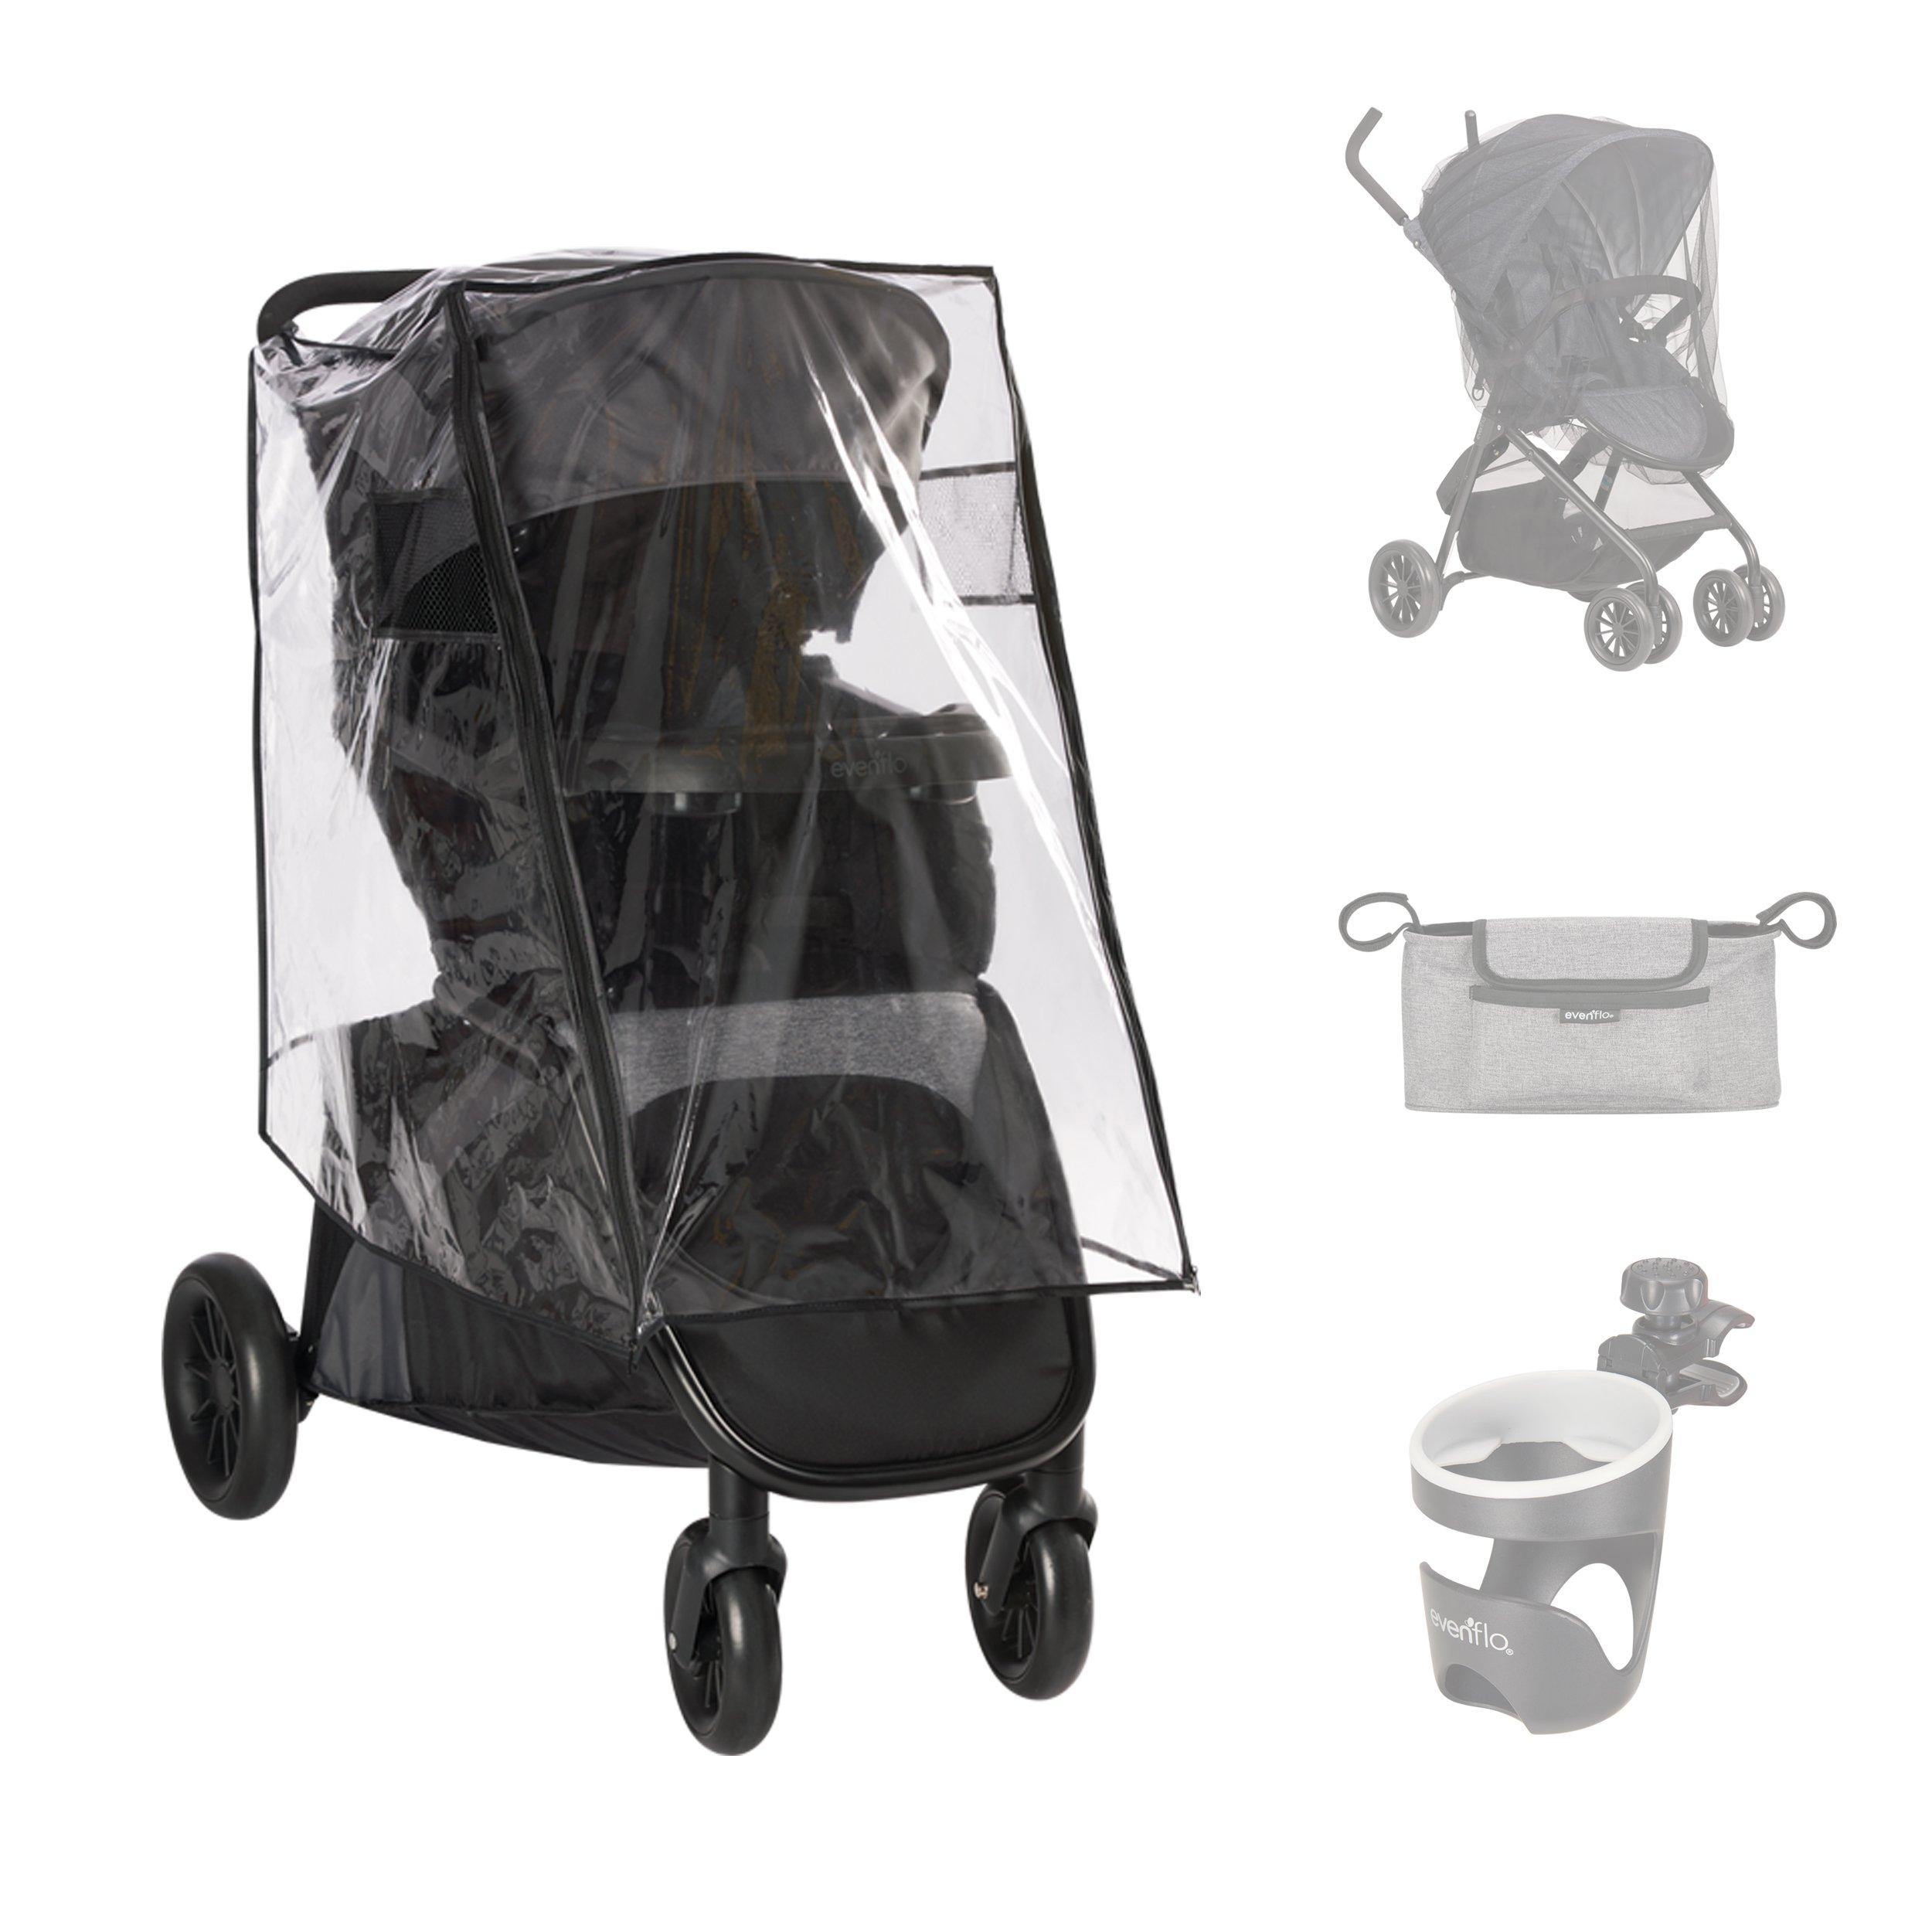 Evenflo Stroller Accessories Starter Kit by Evenflo (Image #3)